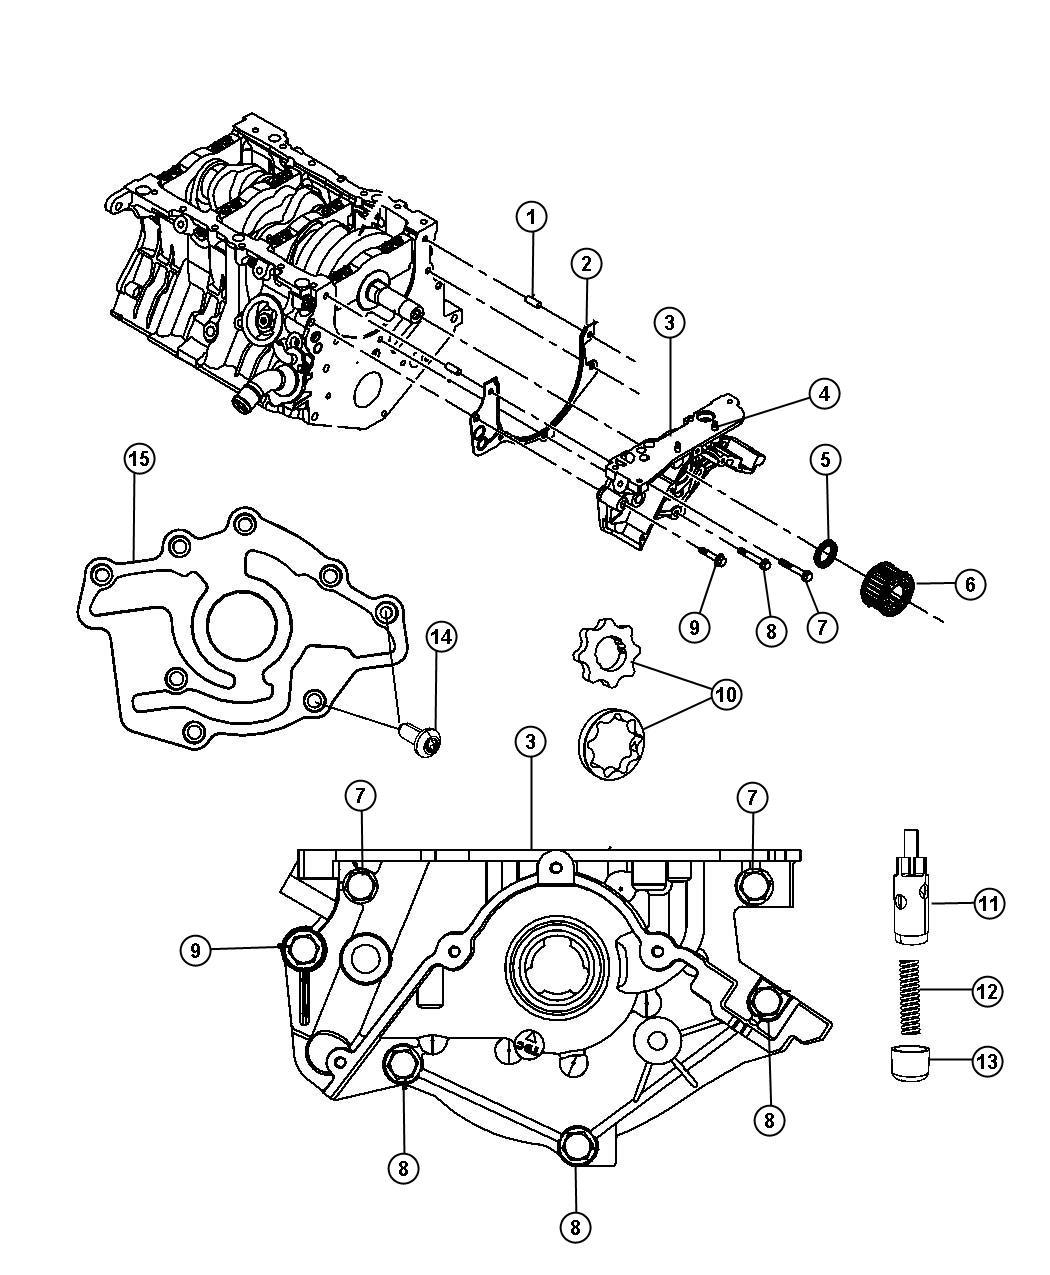 Jeep Wrangler Cap. Oil pressure relief valve. 27, oil